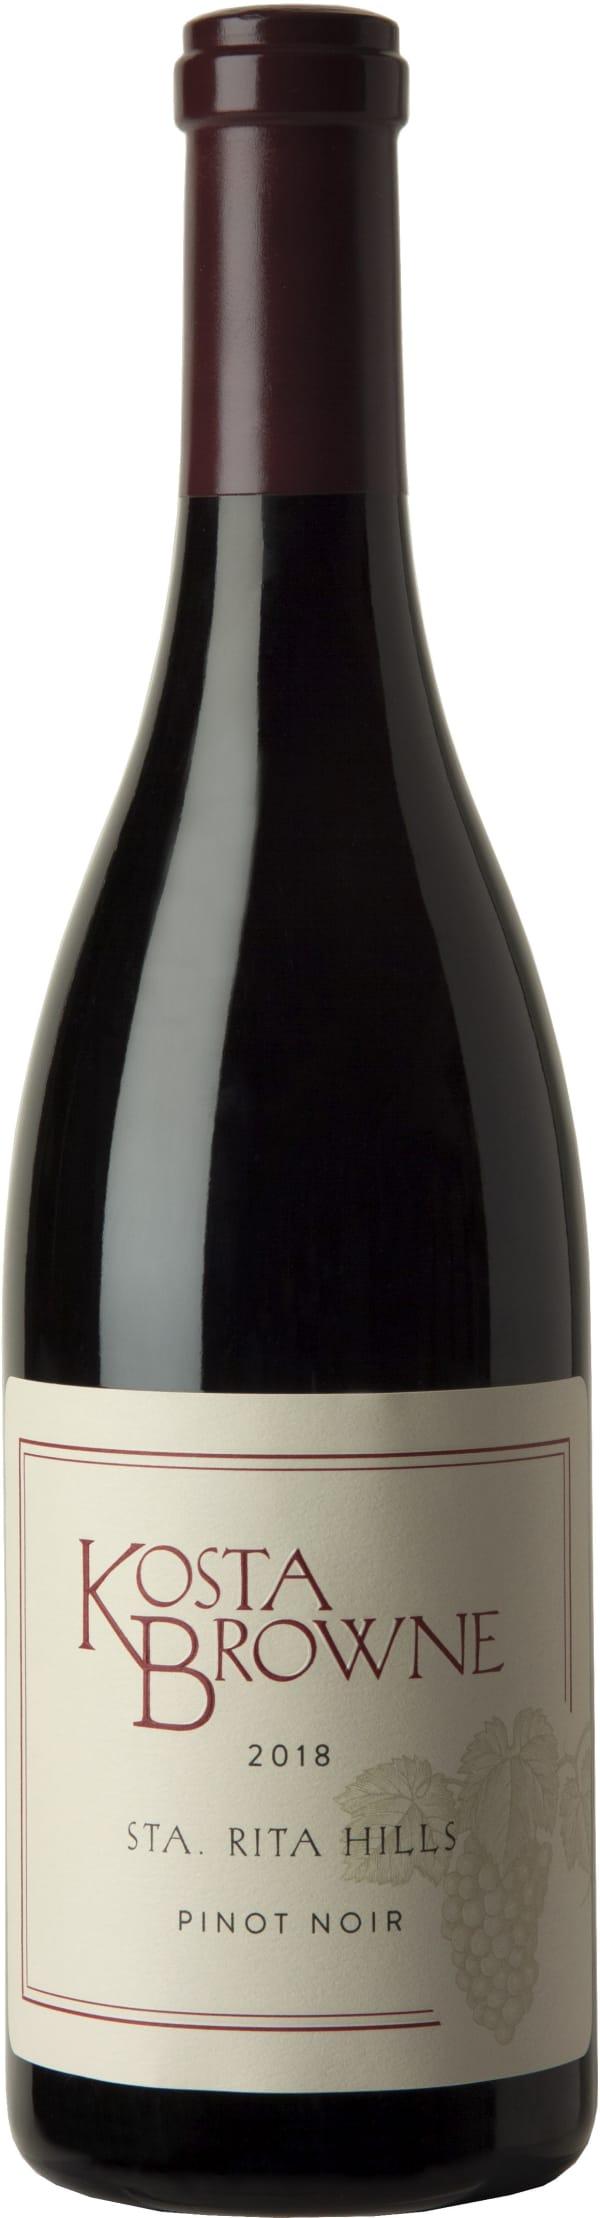 Kosta Browne Sta. Rita Hills Pinot Noir 2018